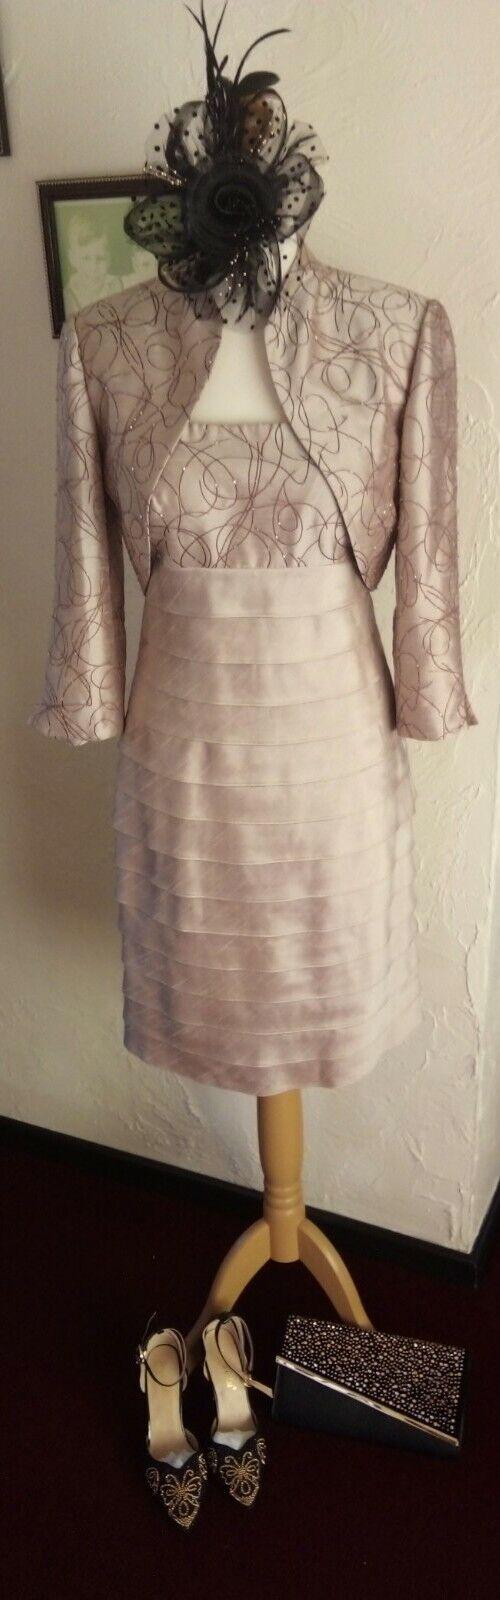 Complete wedding outfit JESSICA HOWARD dress/jacket + shoes/bag/fascinator